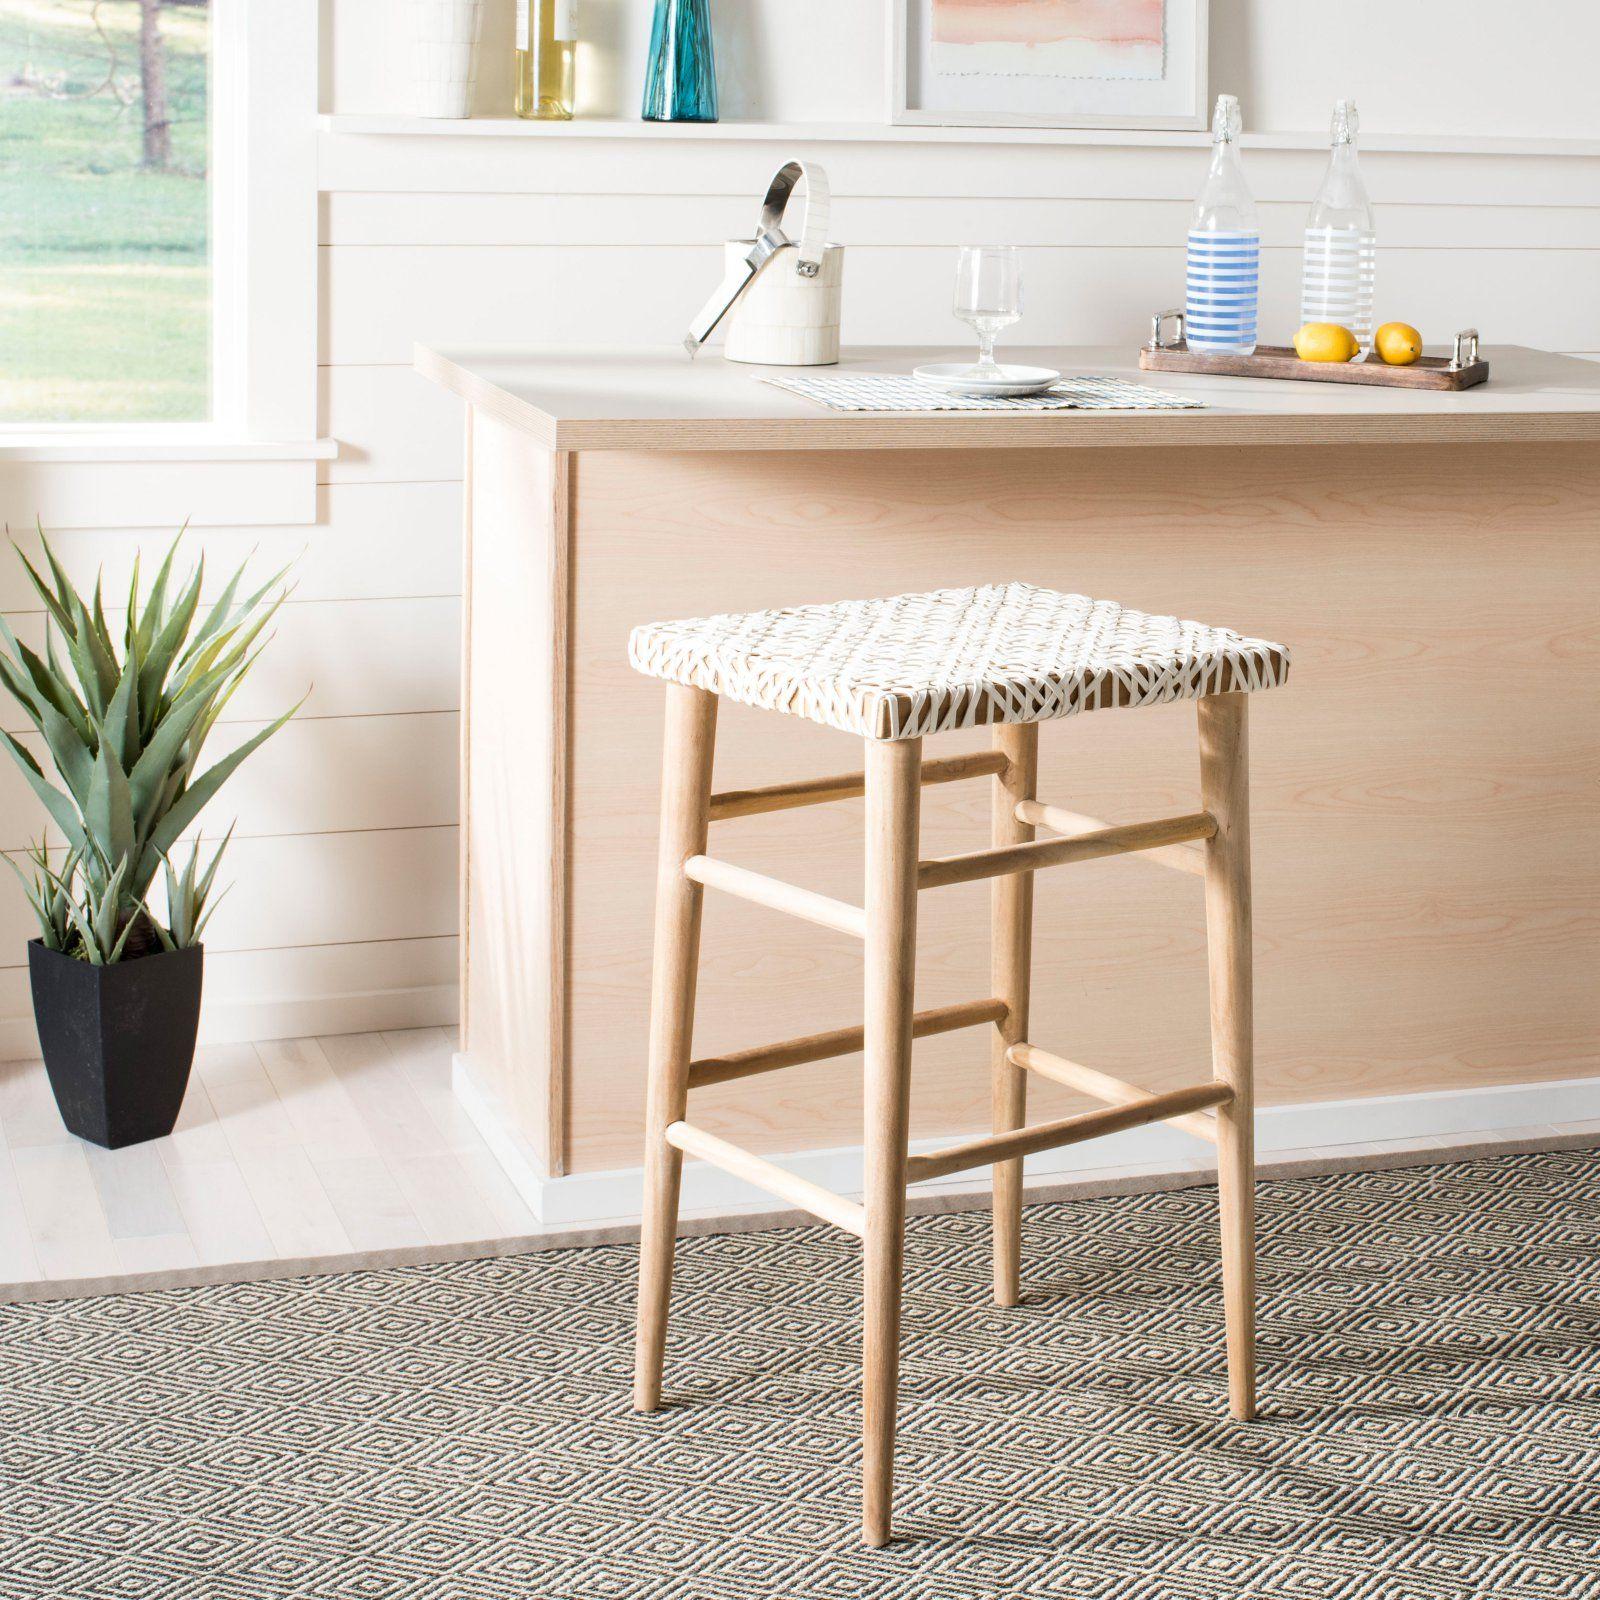 Outstanding Safavieh Kaleo 30 In Woven Leather Bar Stool In 2019 Lamtechconsult Wood Chair Design Ideas Lamtechconsultcom